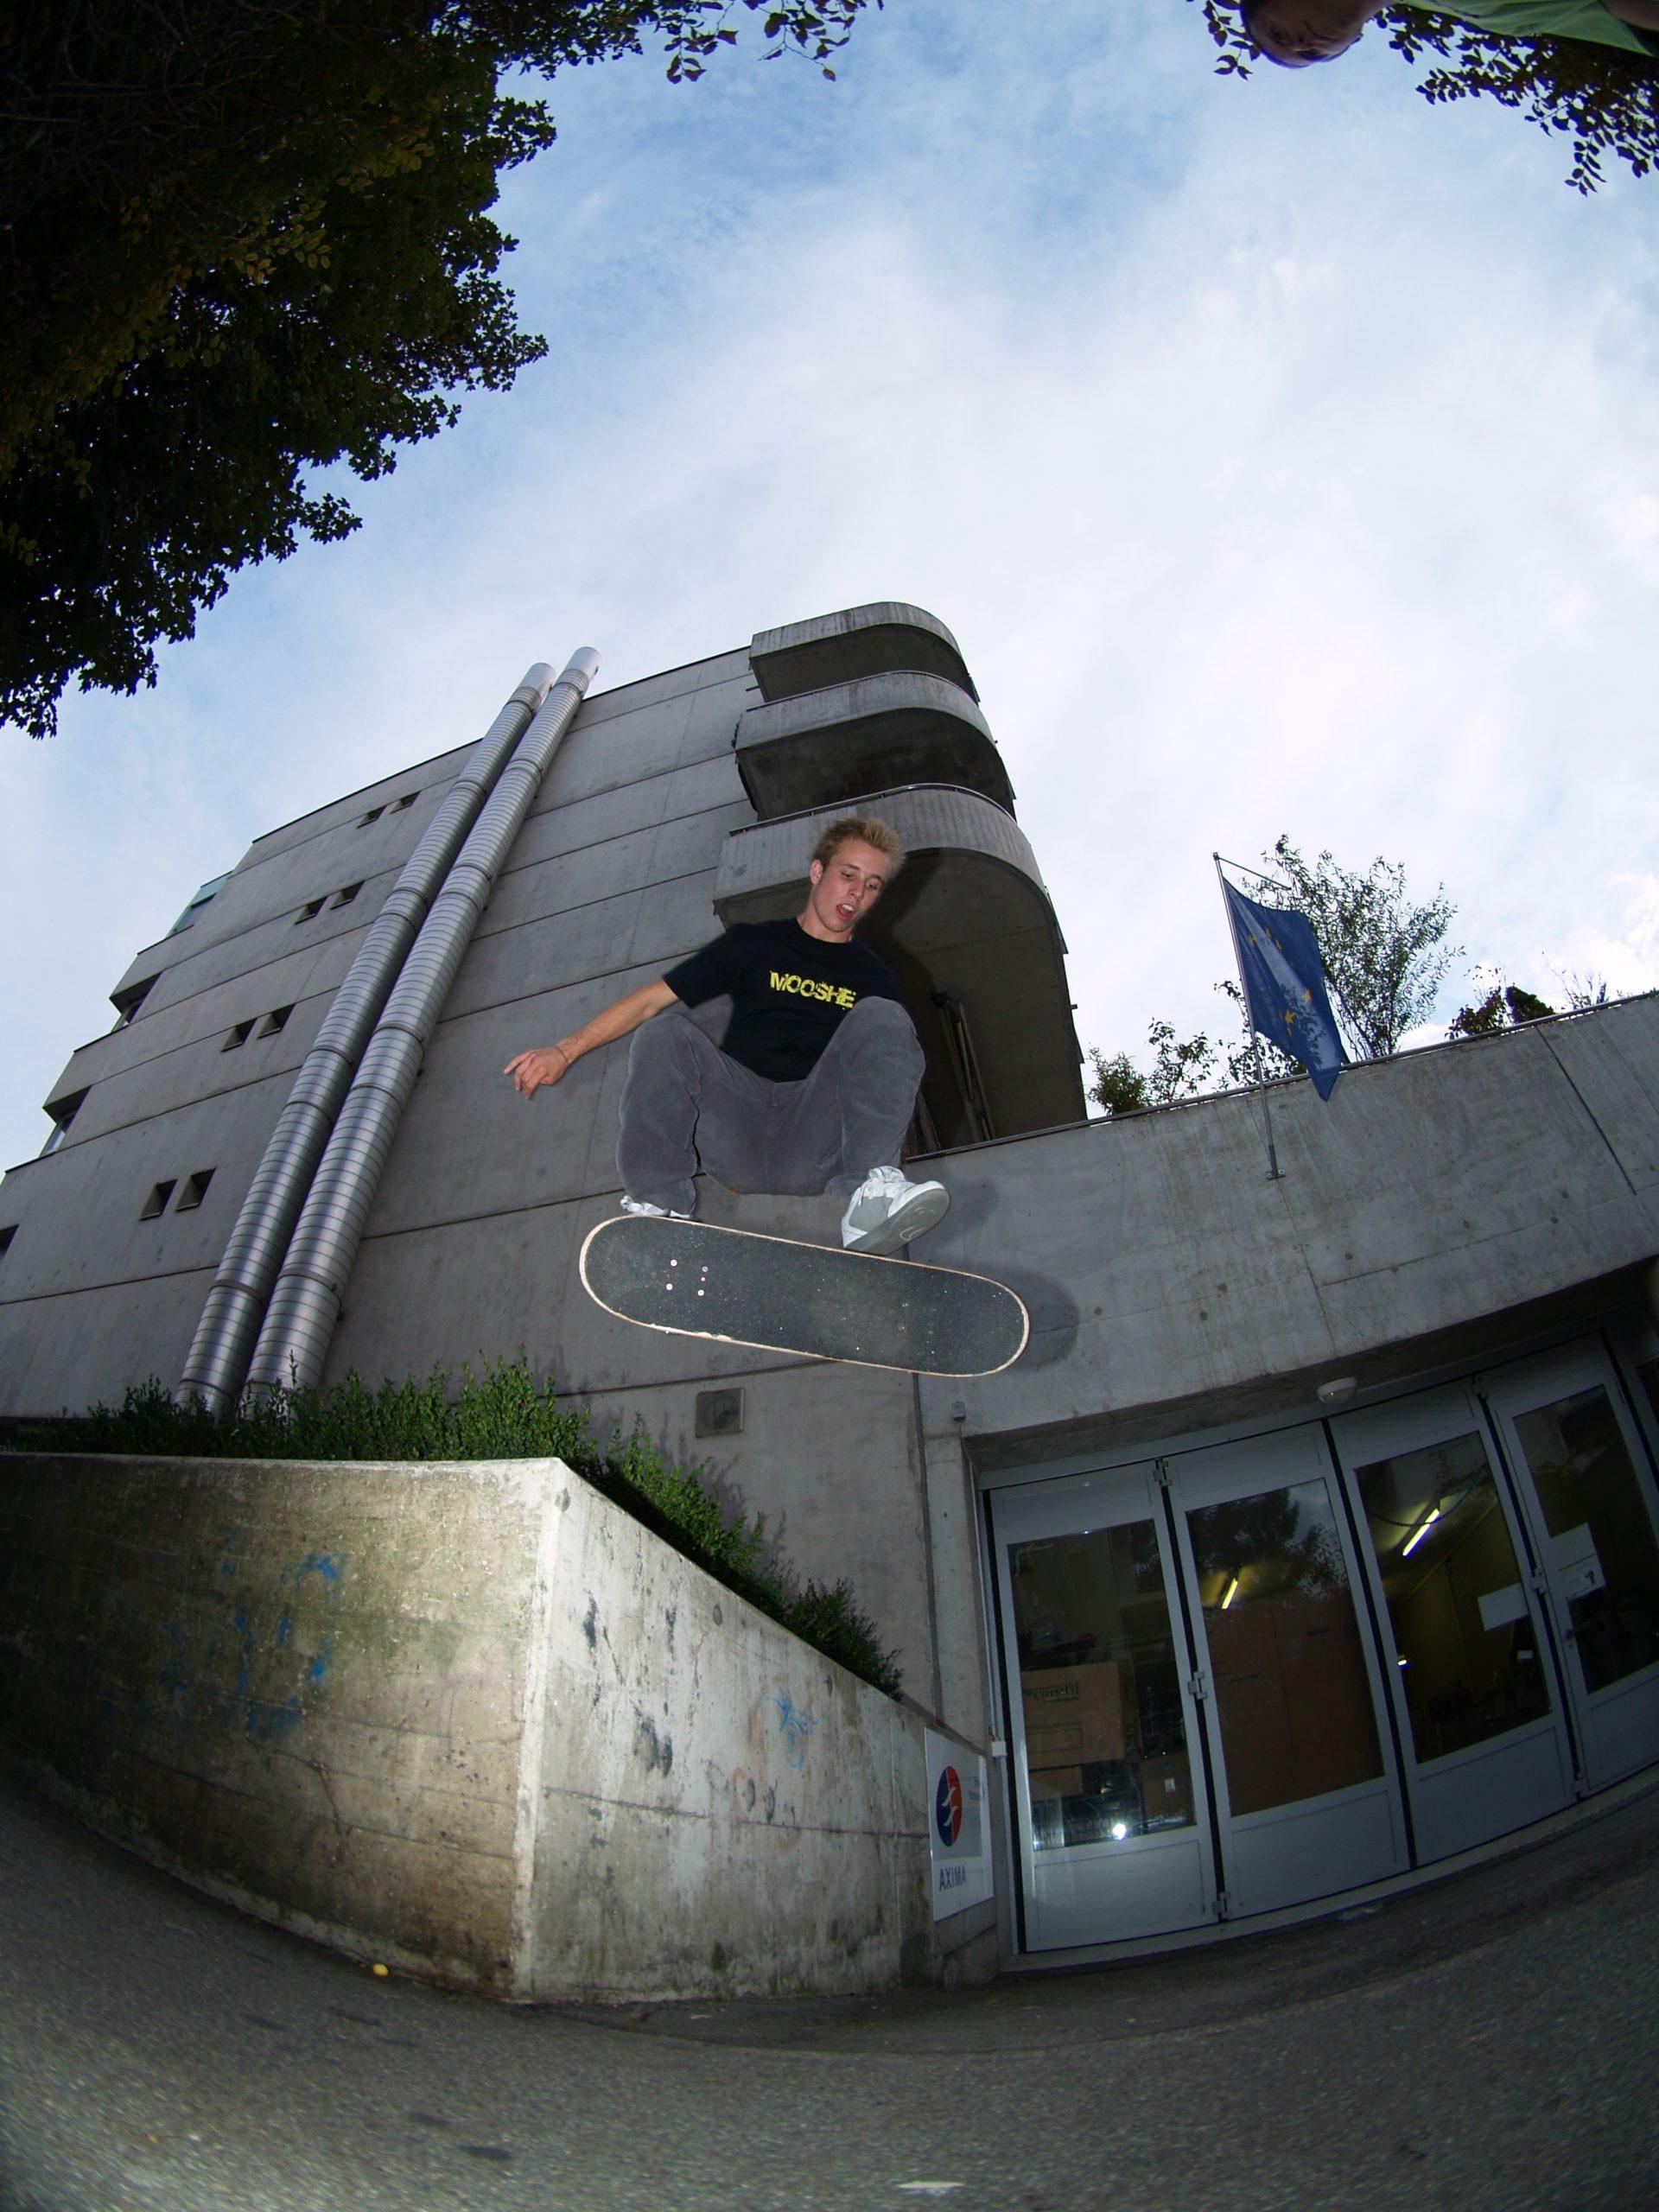 Nollie flip Johan Bavaud